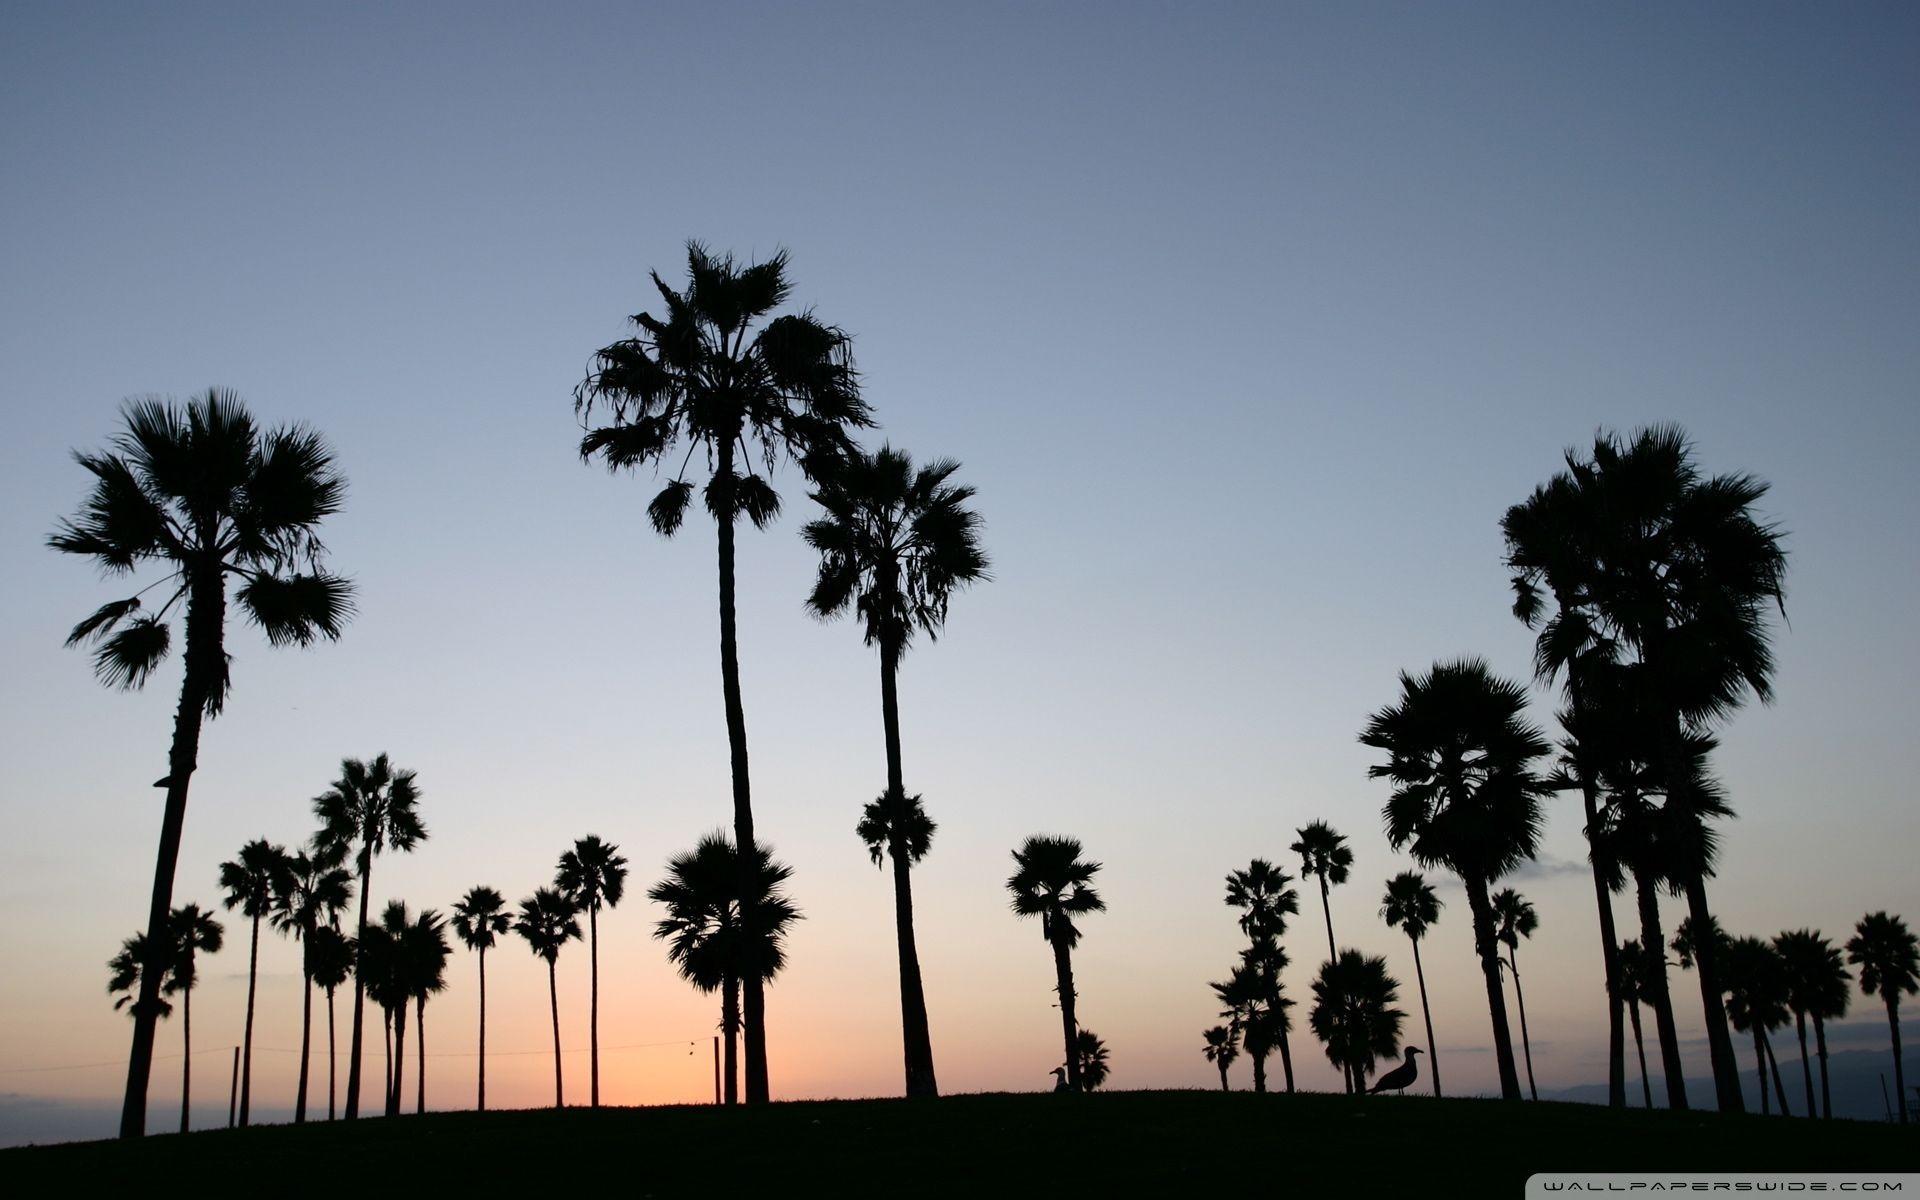 Palm Trees Silhouette ❤ 4k Hd Desktop Wallpaper For - Palm Trees Desktop Wallpaper Hd - HD Wallpaper